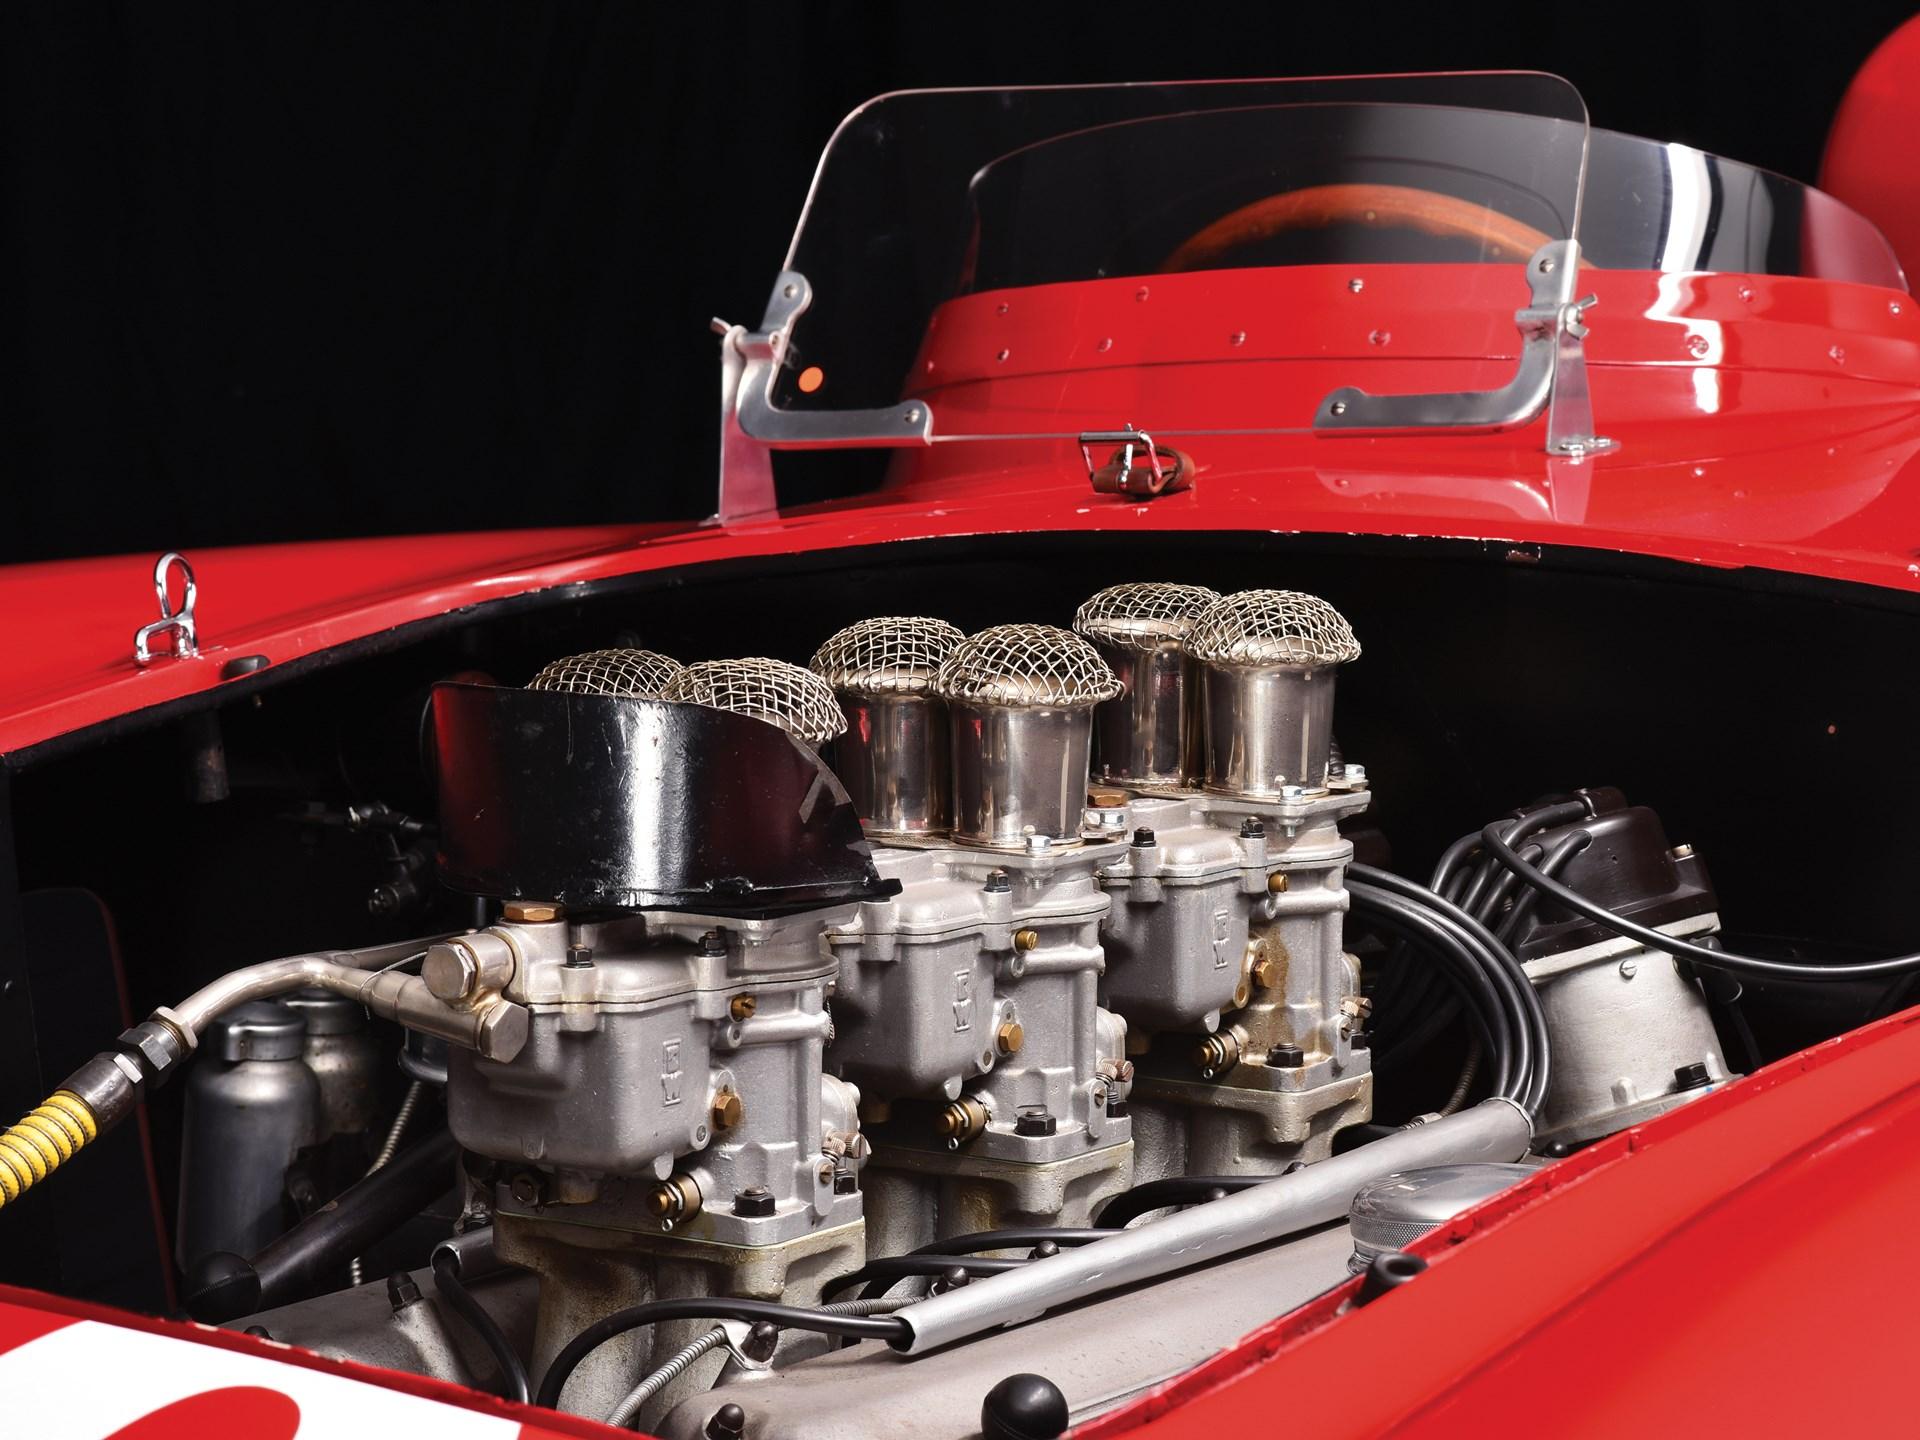 1956 Ferrari 290 MM by Scaglietti